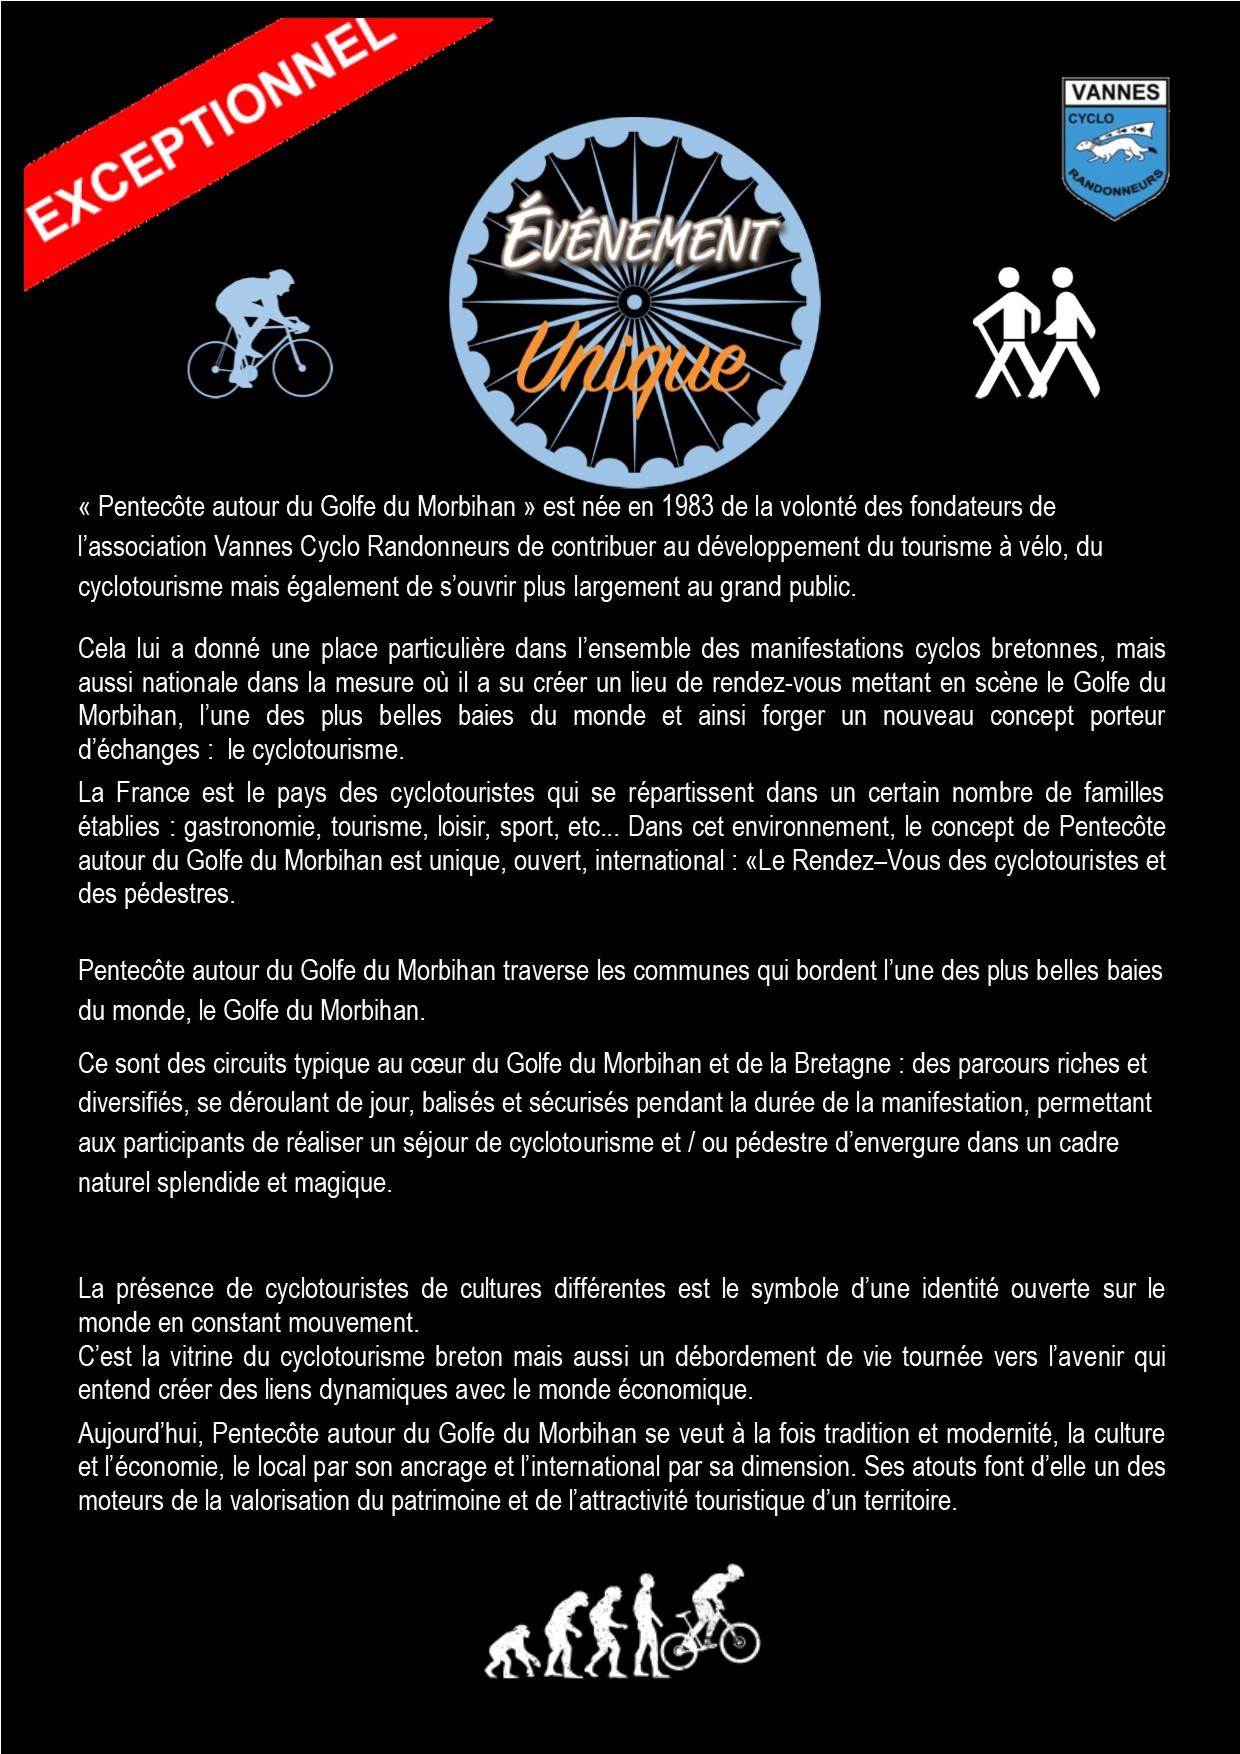 DOSSIER DE PARTENARIAT PENTECOTE AUTOUR DU GOLFE MORBIHAN 2020 7.jpg